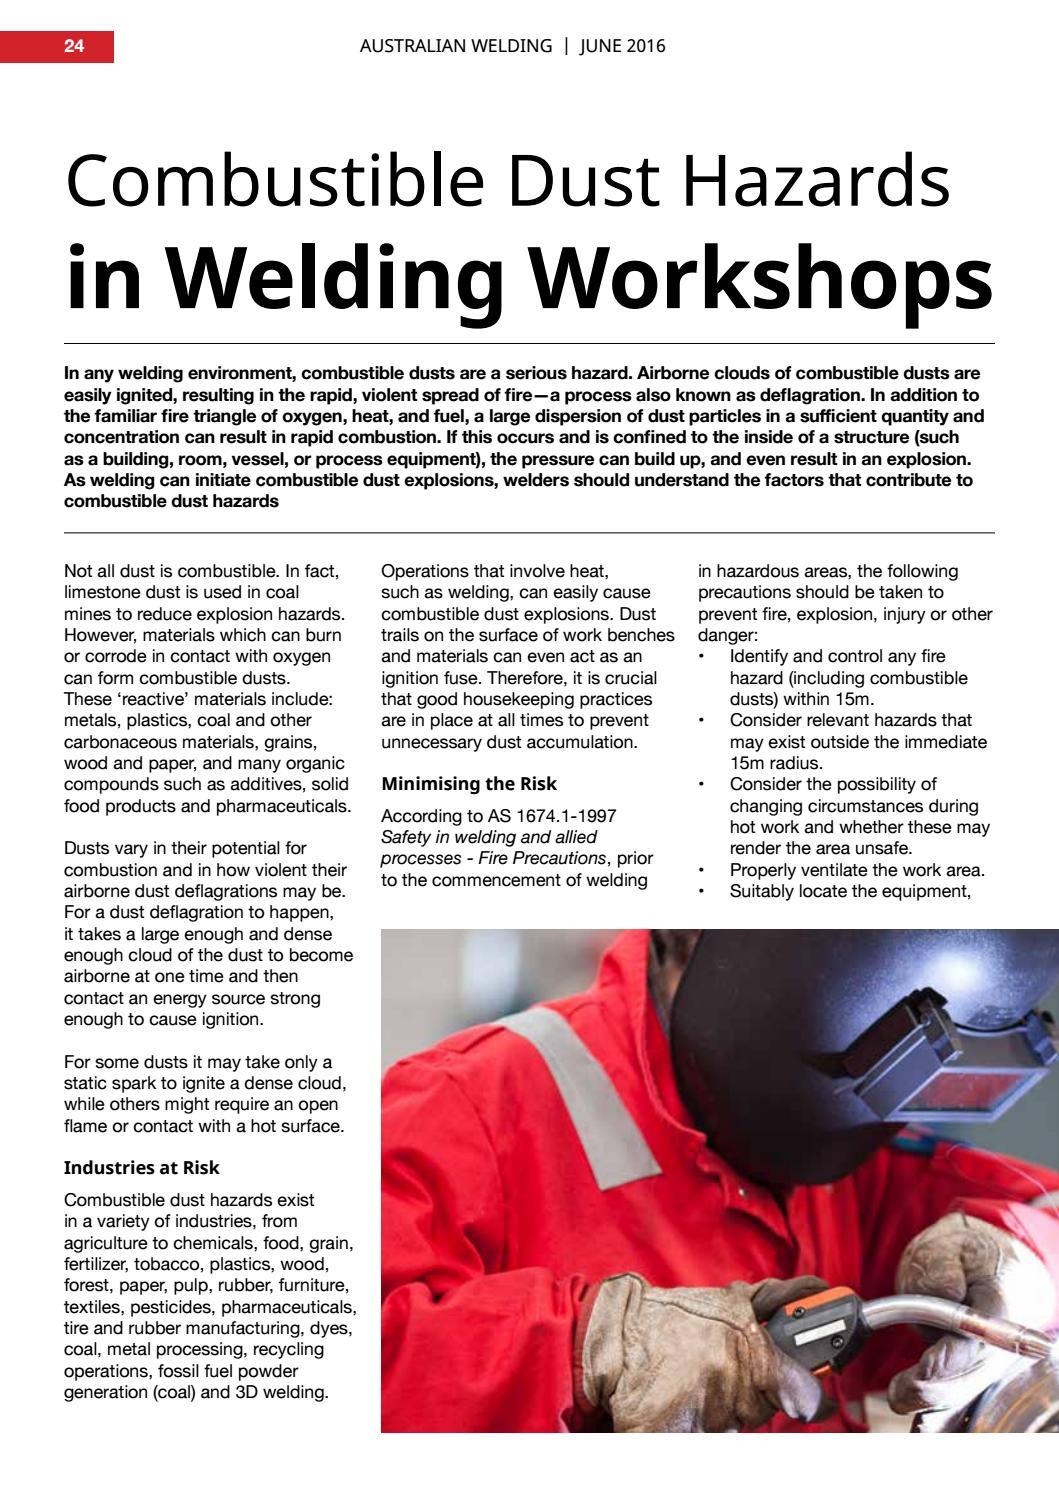 Combustible dust hazards in welding workshops by Weld Australia - issuu